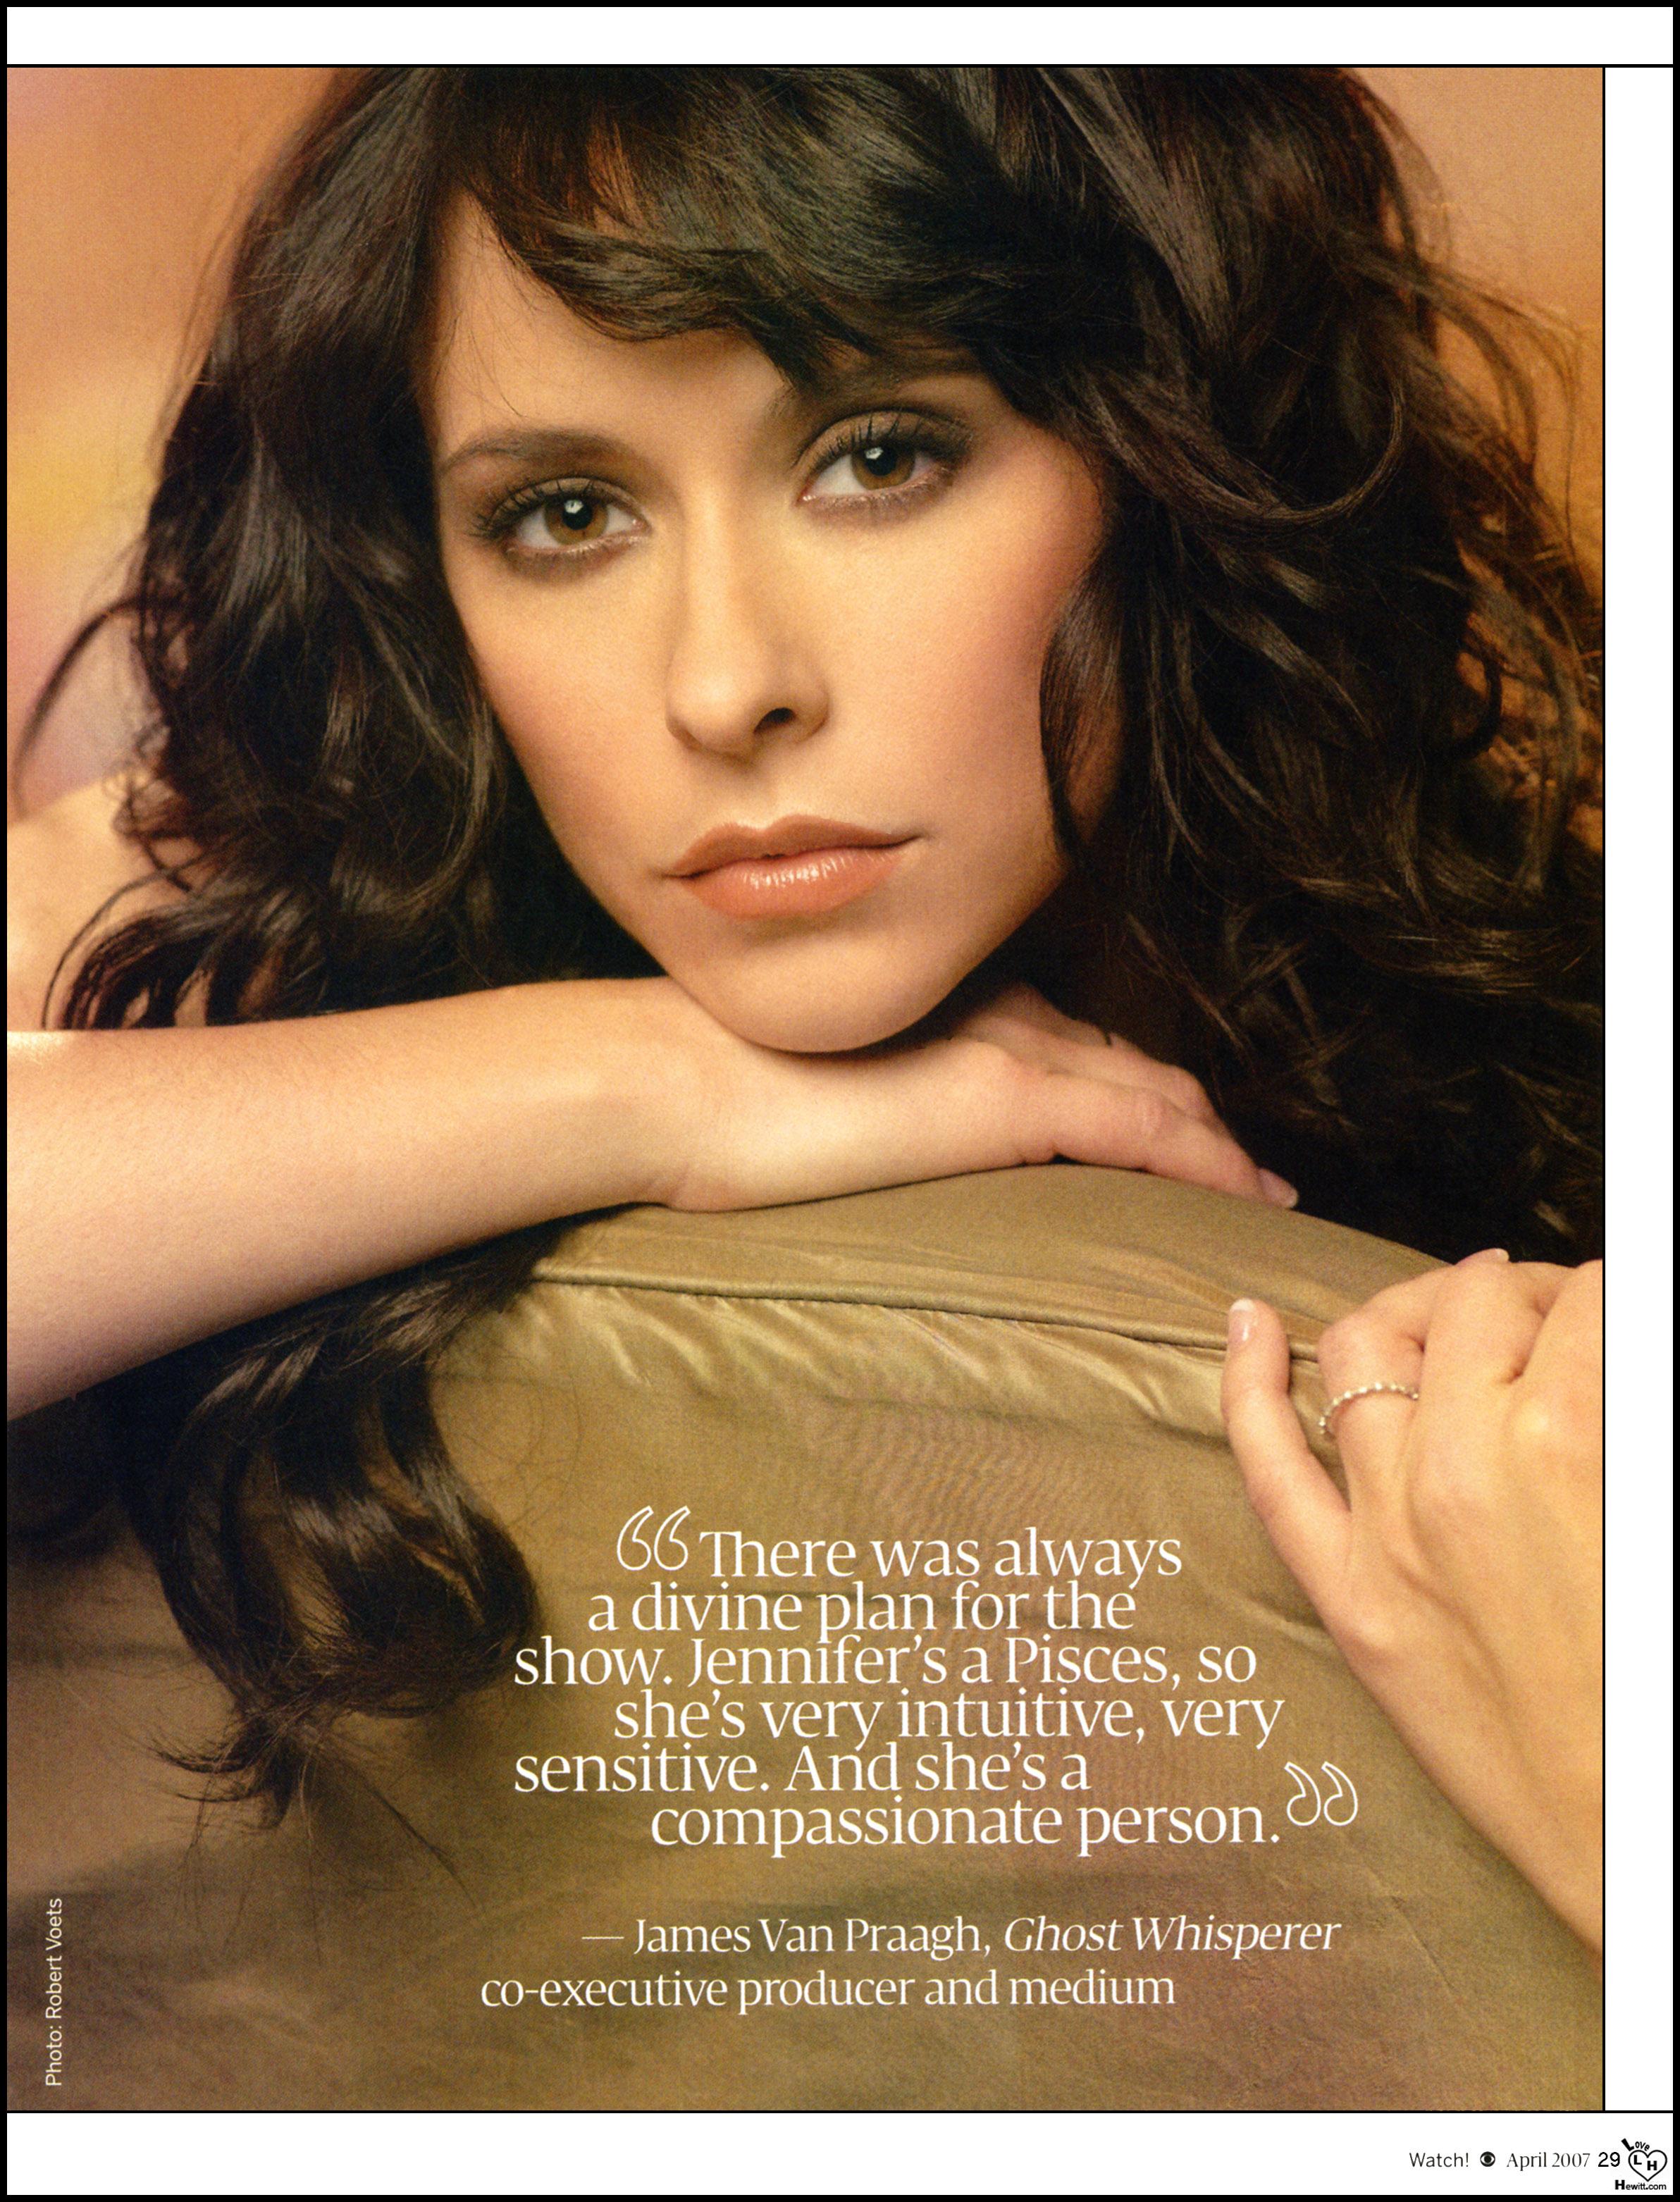 01738_Jennifer_Love_Hewitt_CBS_Watch_Magazine_April_2007_Page_4_122_13lo.jpg